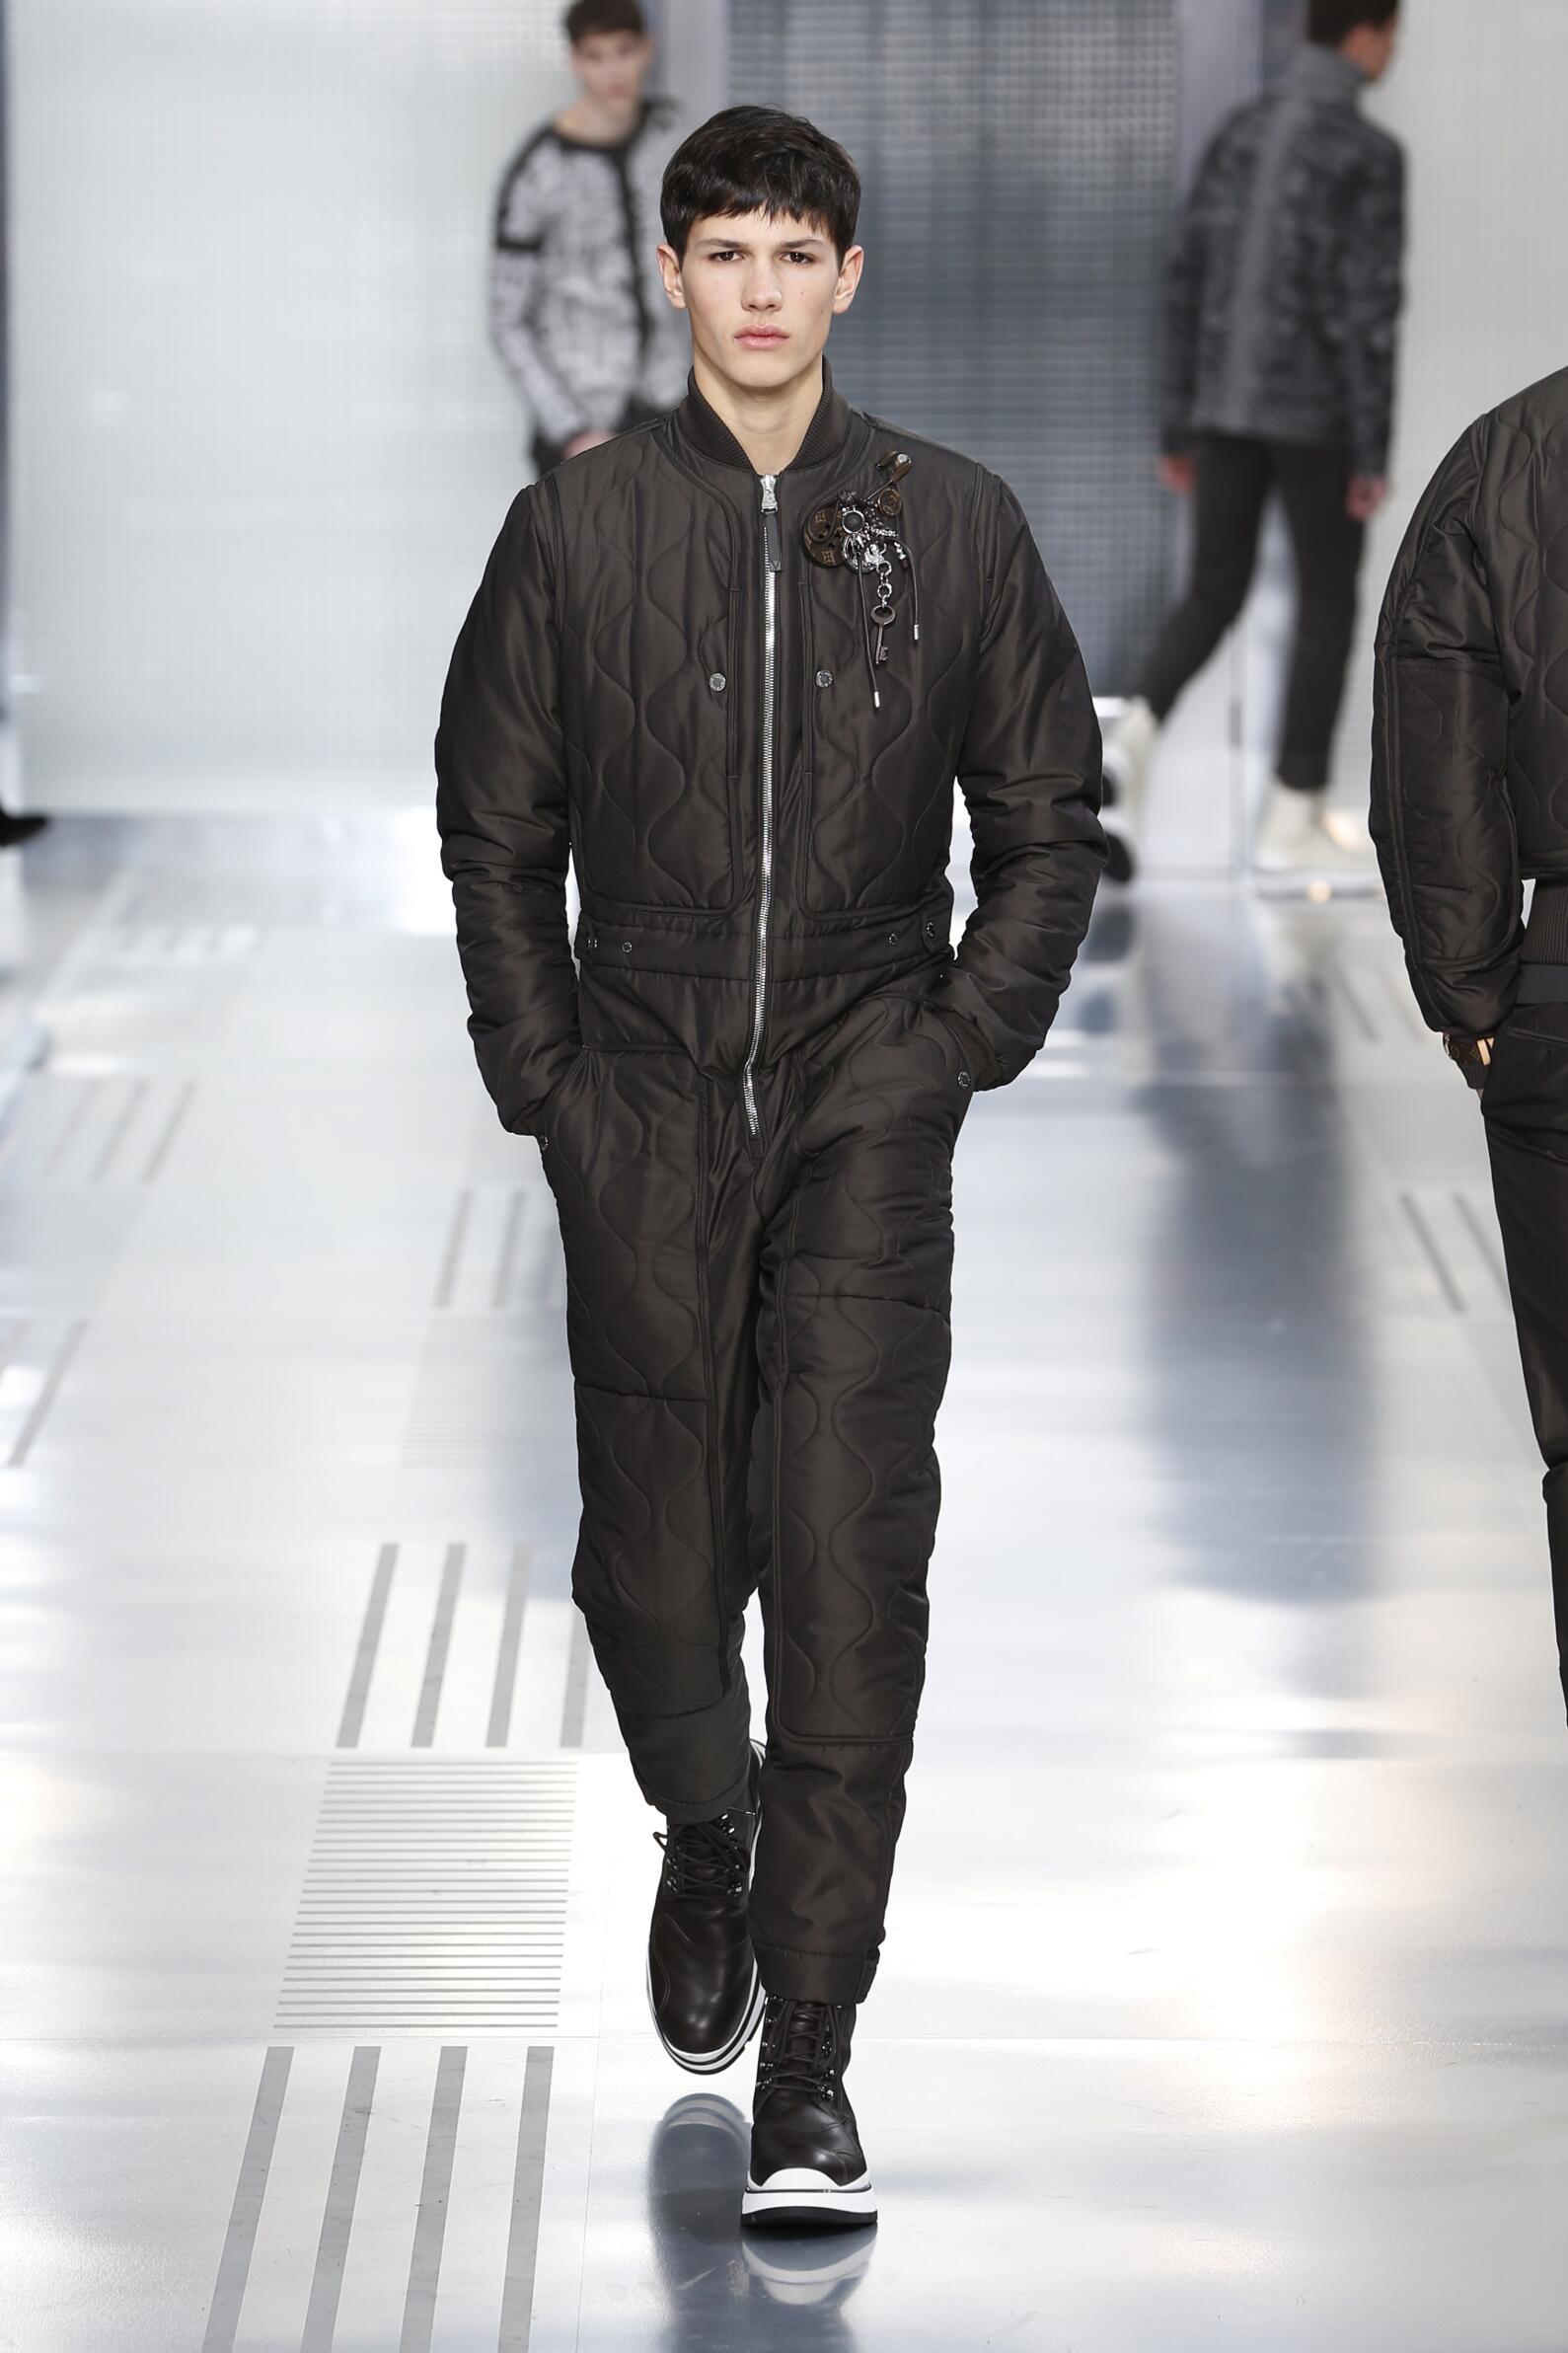 Fashion Man Model Louis Vuitton Collection Catwalk